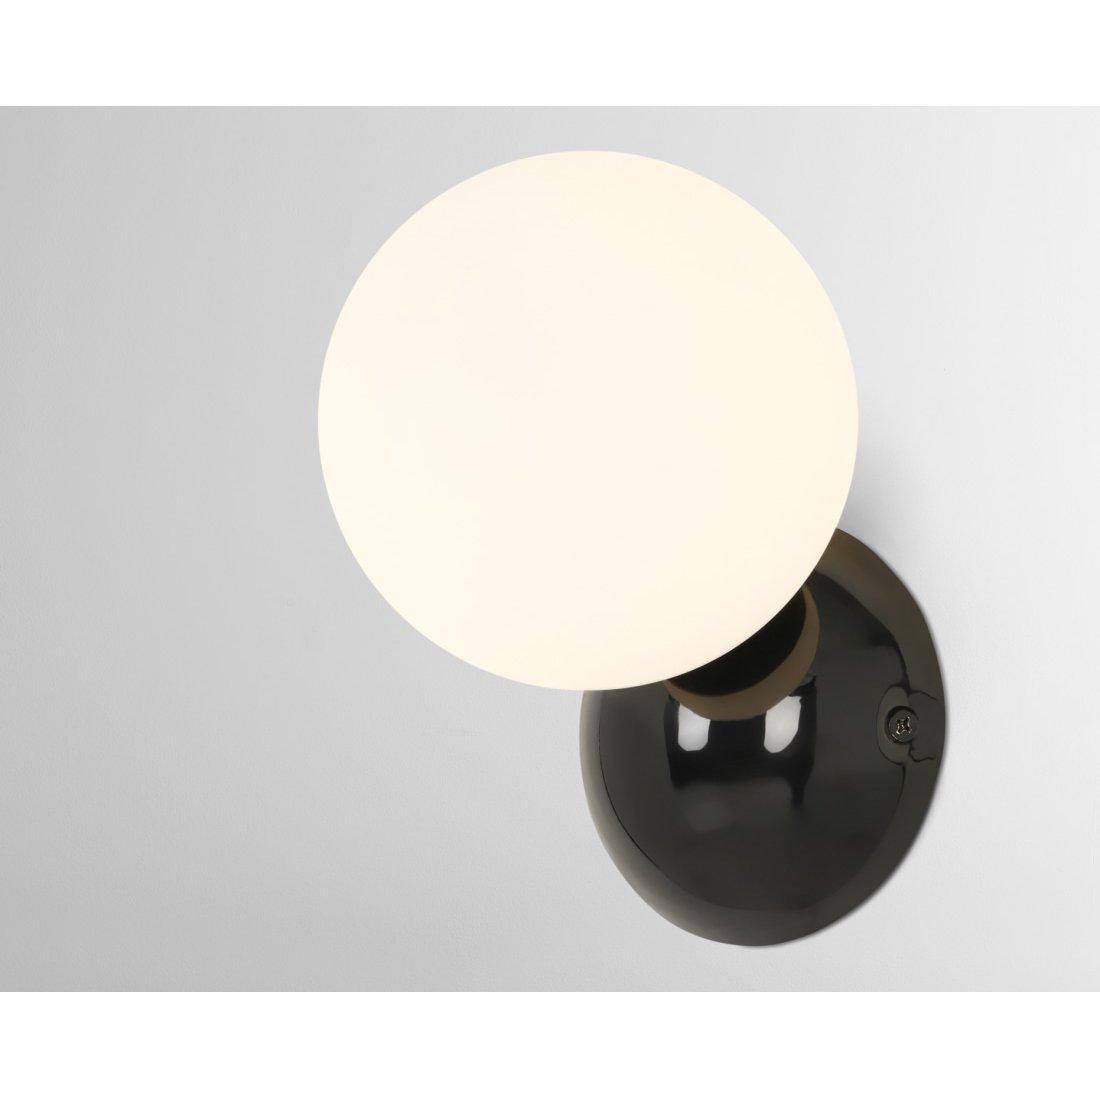 image-Vetro Bathroom Wall Light, Black